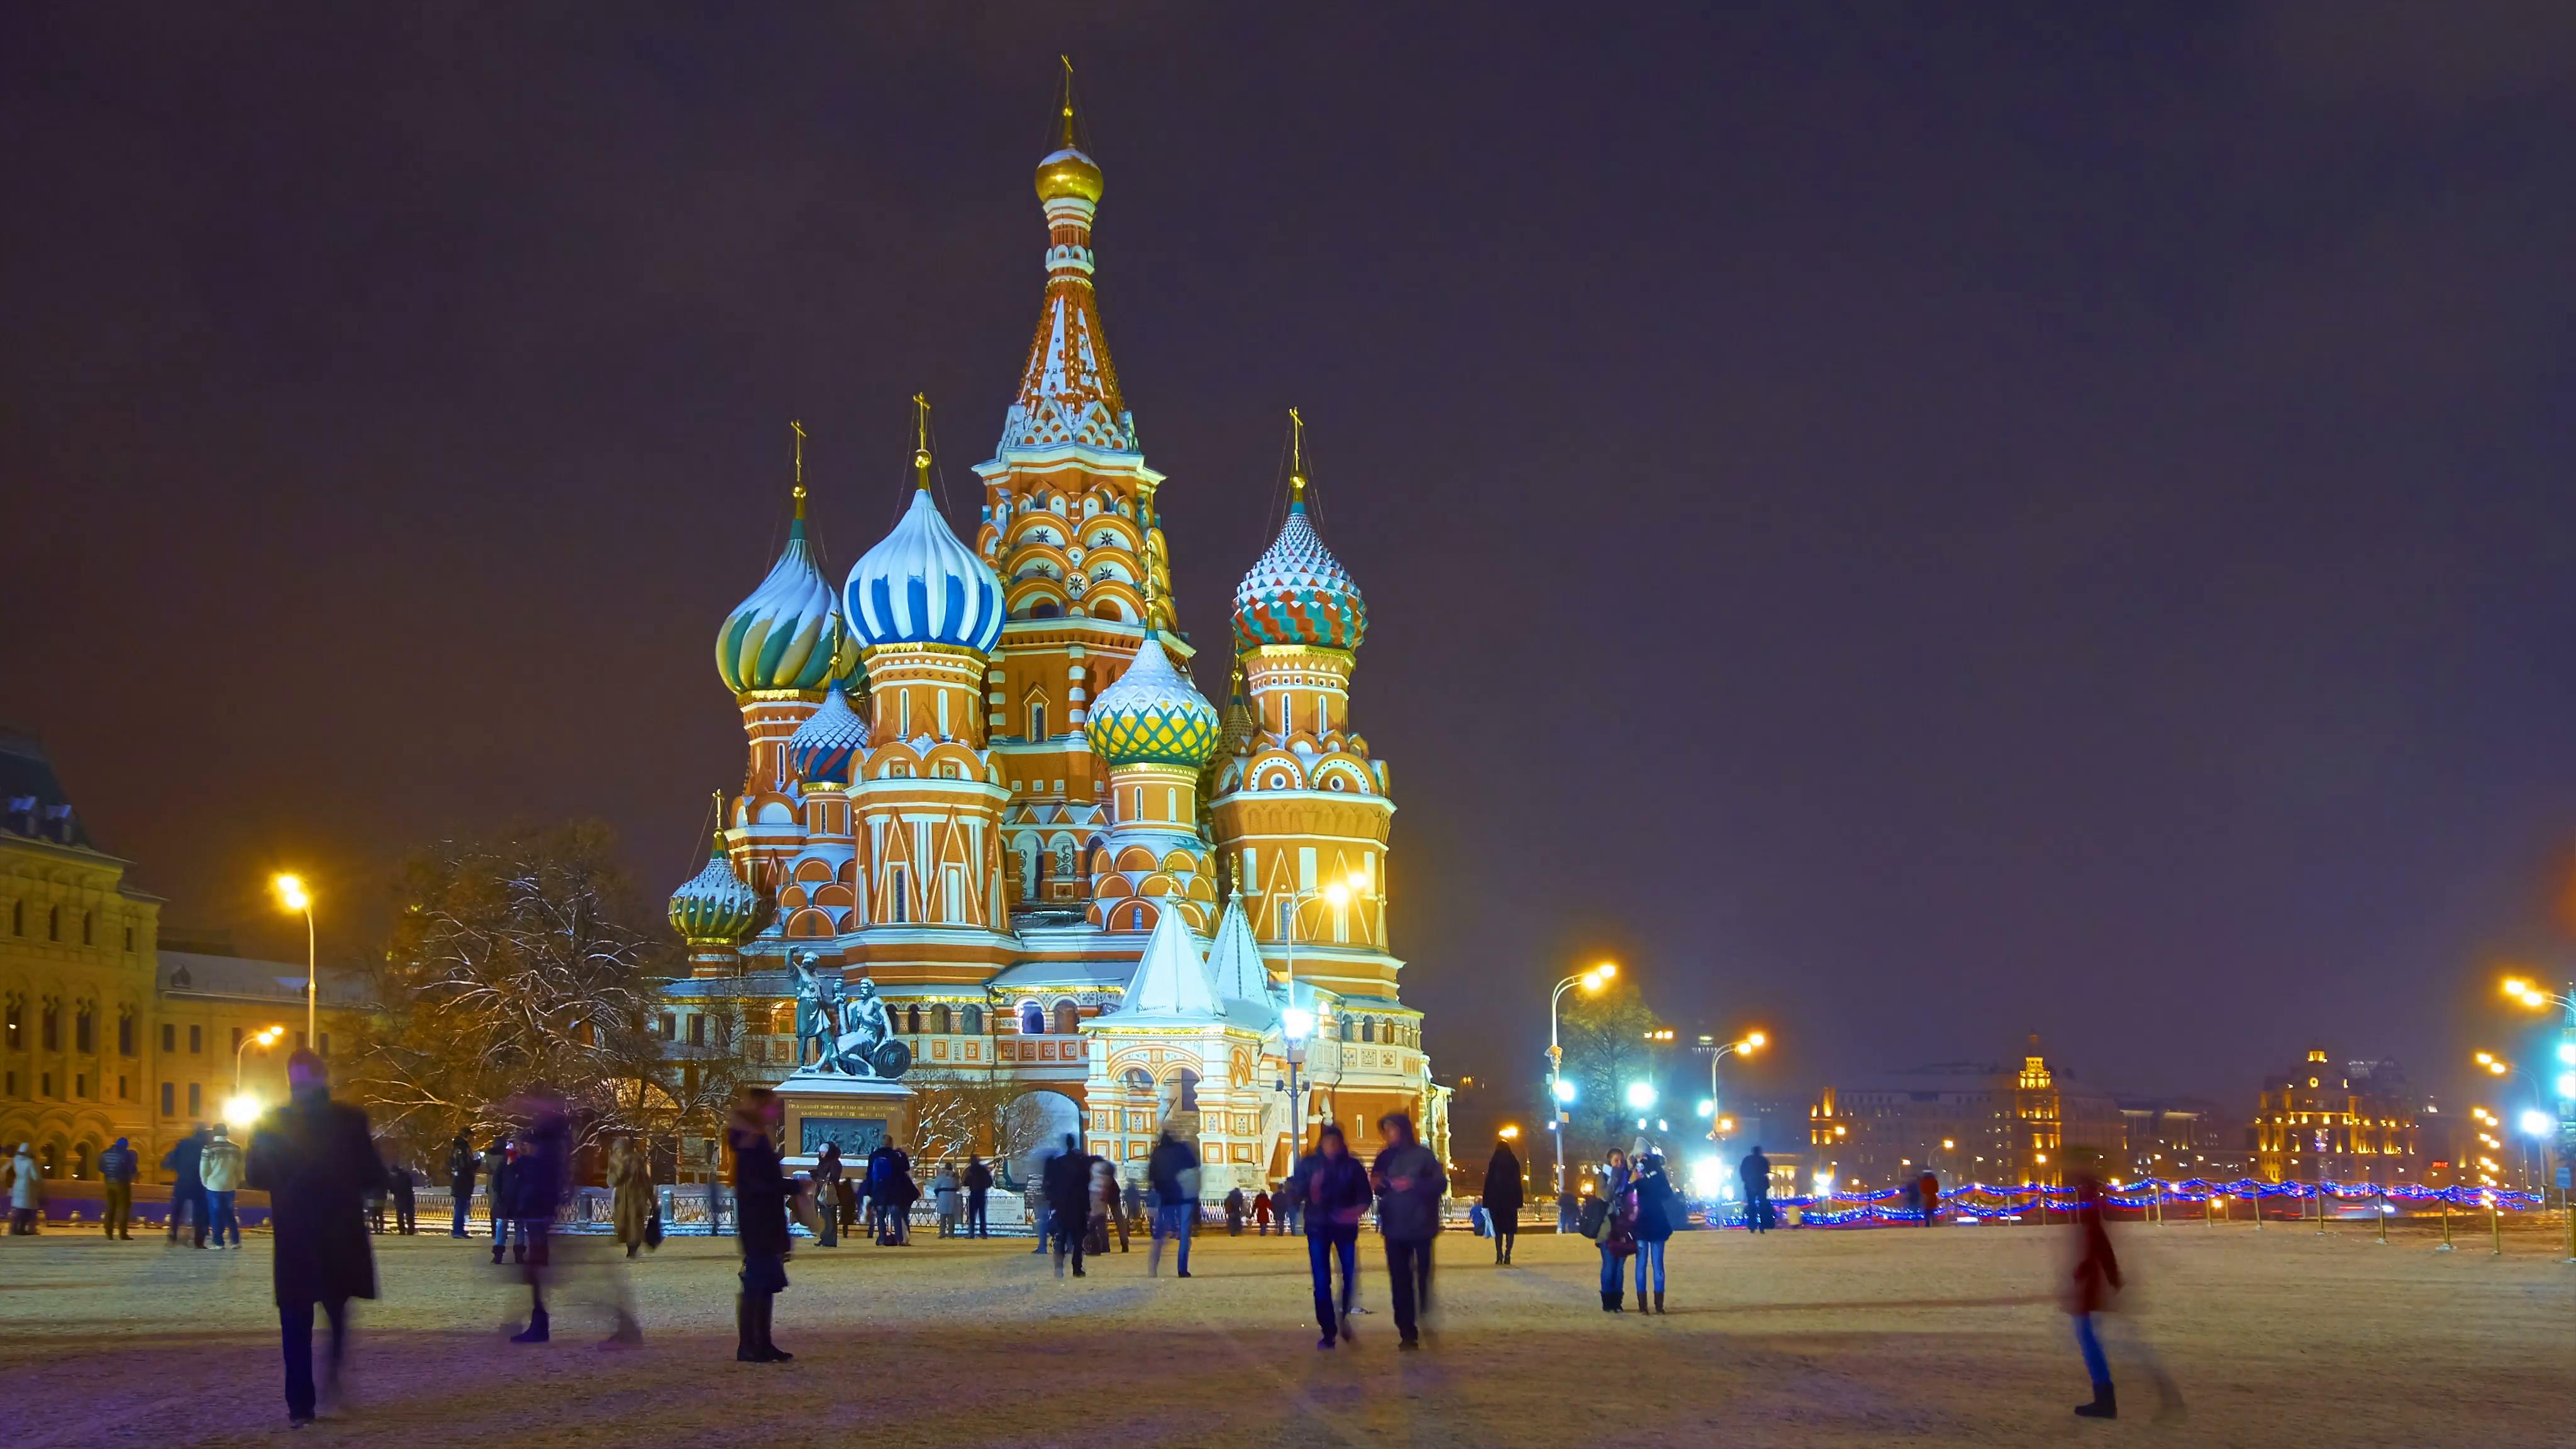 russia tour two caitals of russia excursia tours explore russia